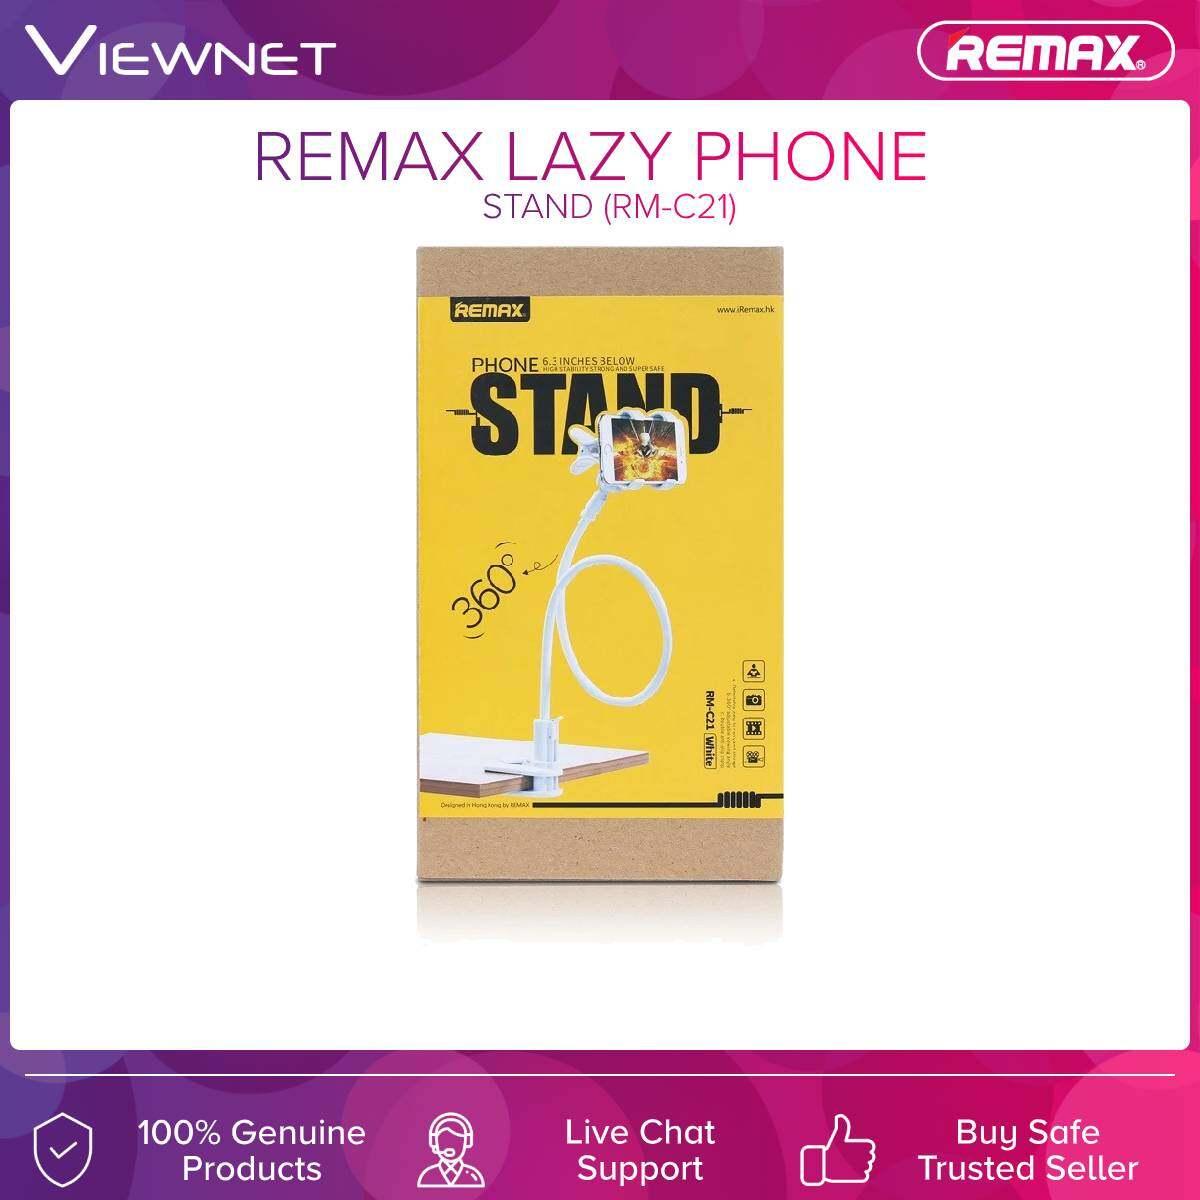 Remax (RM-C21) Lazy Stand For Mobile Random Colour (Blk/Wht)